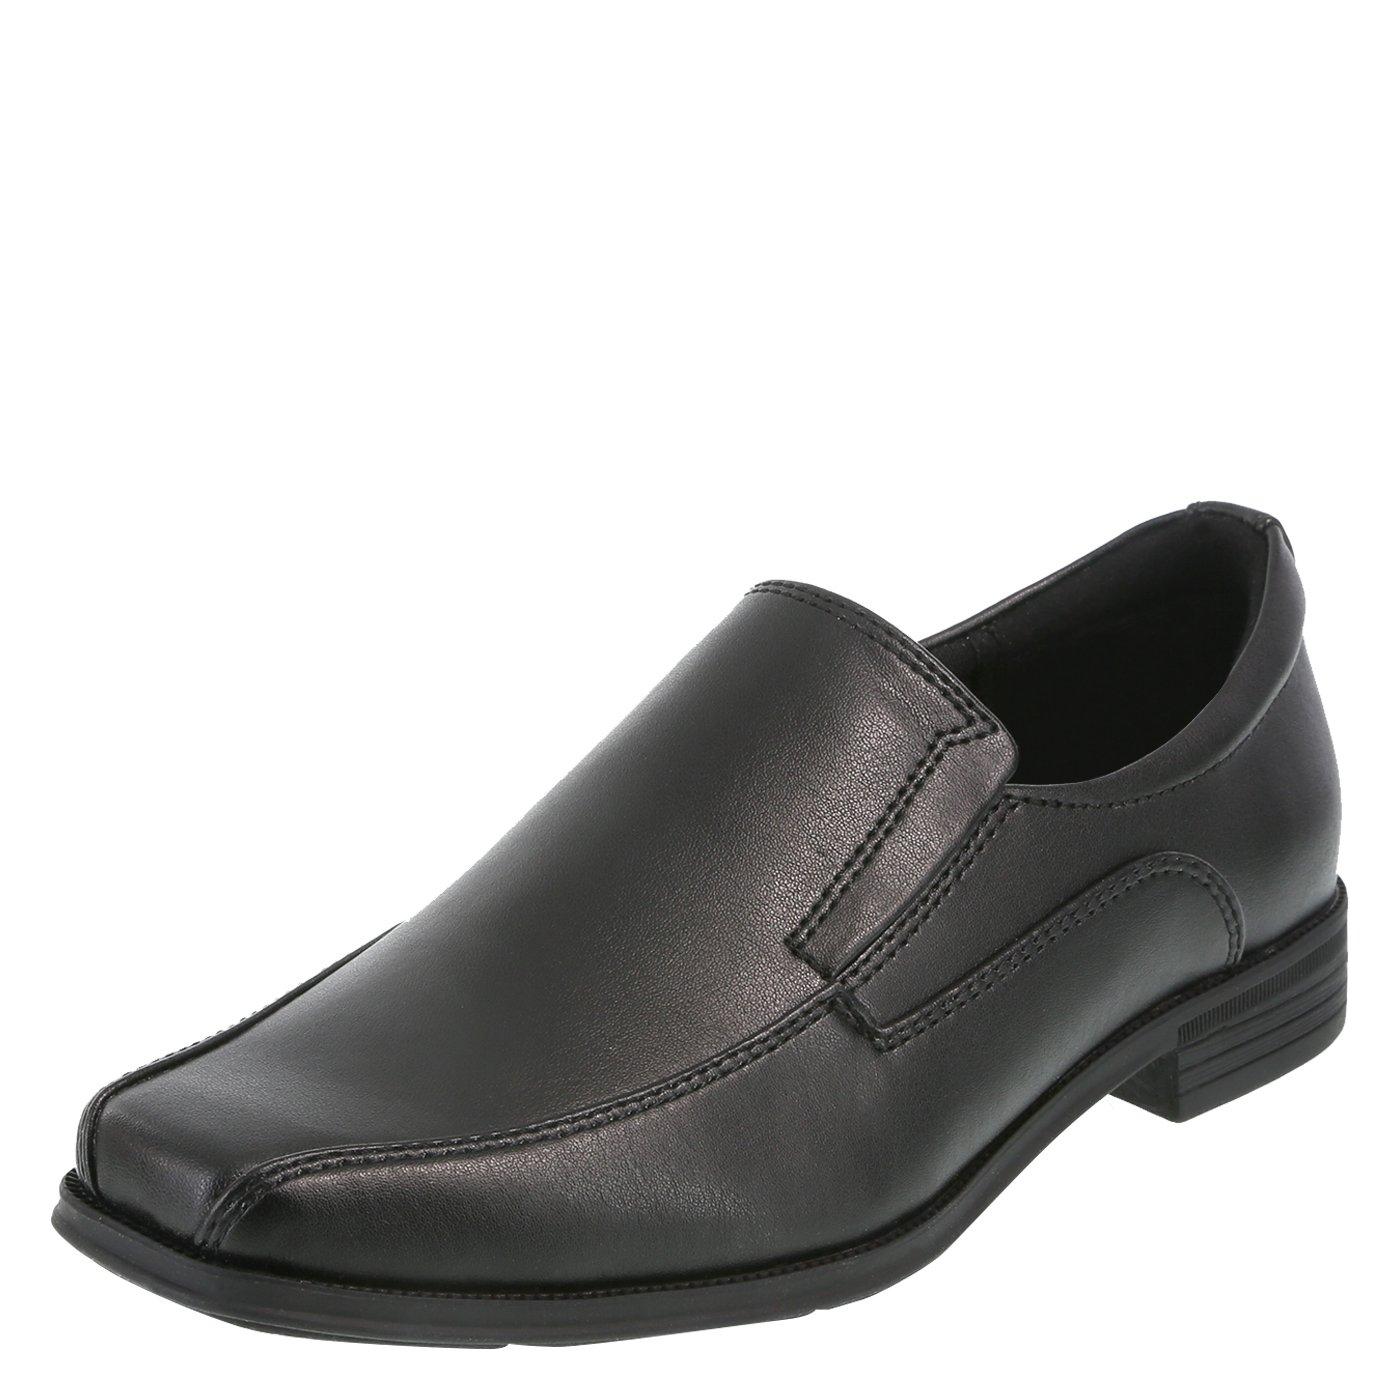 SmartFit Black Boys' Grant Slip-On Dress Shoes 6 Regular